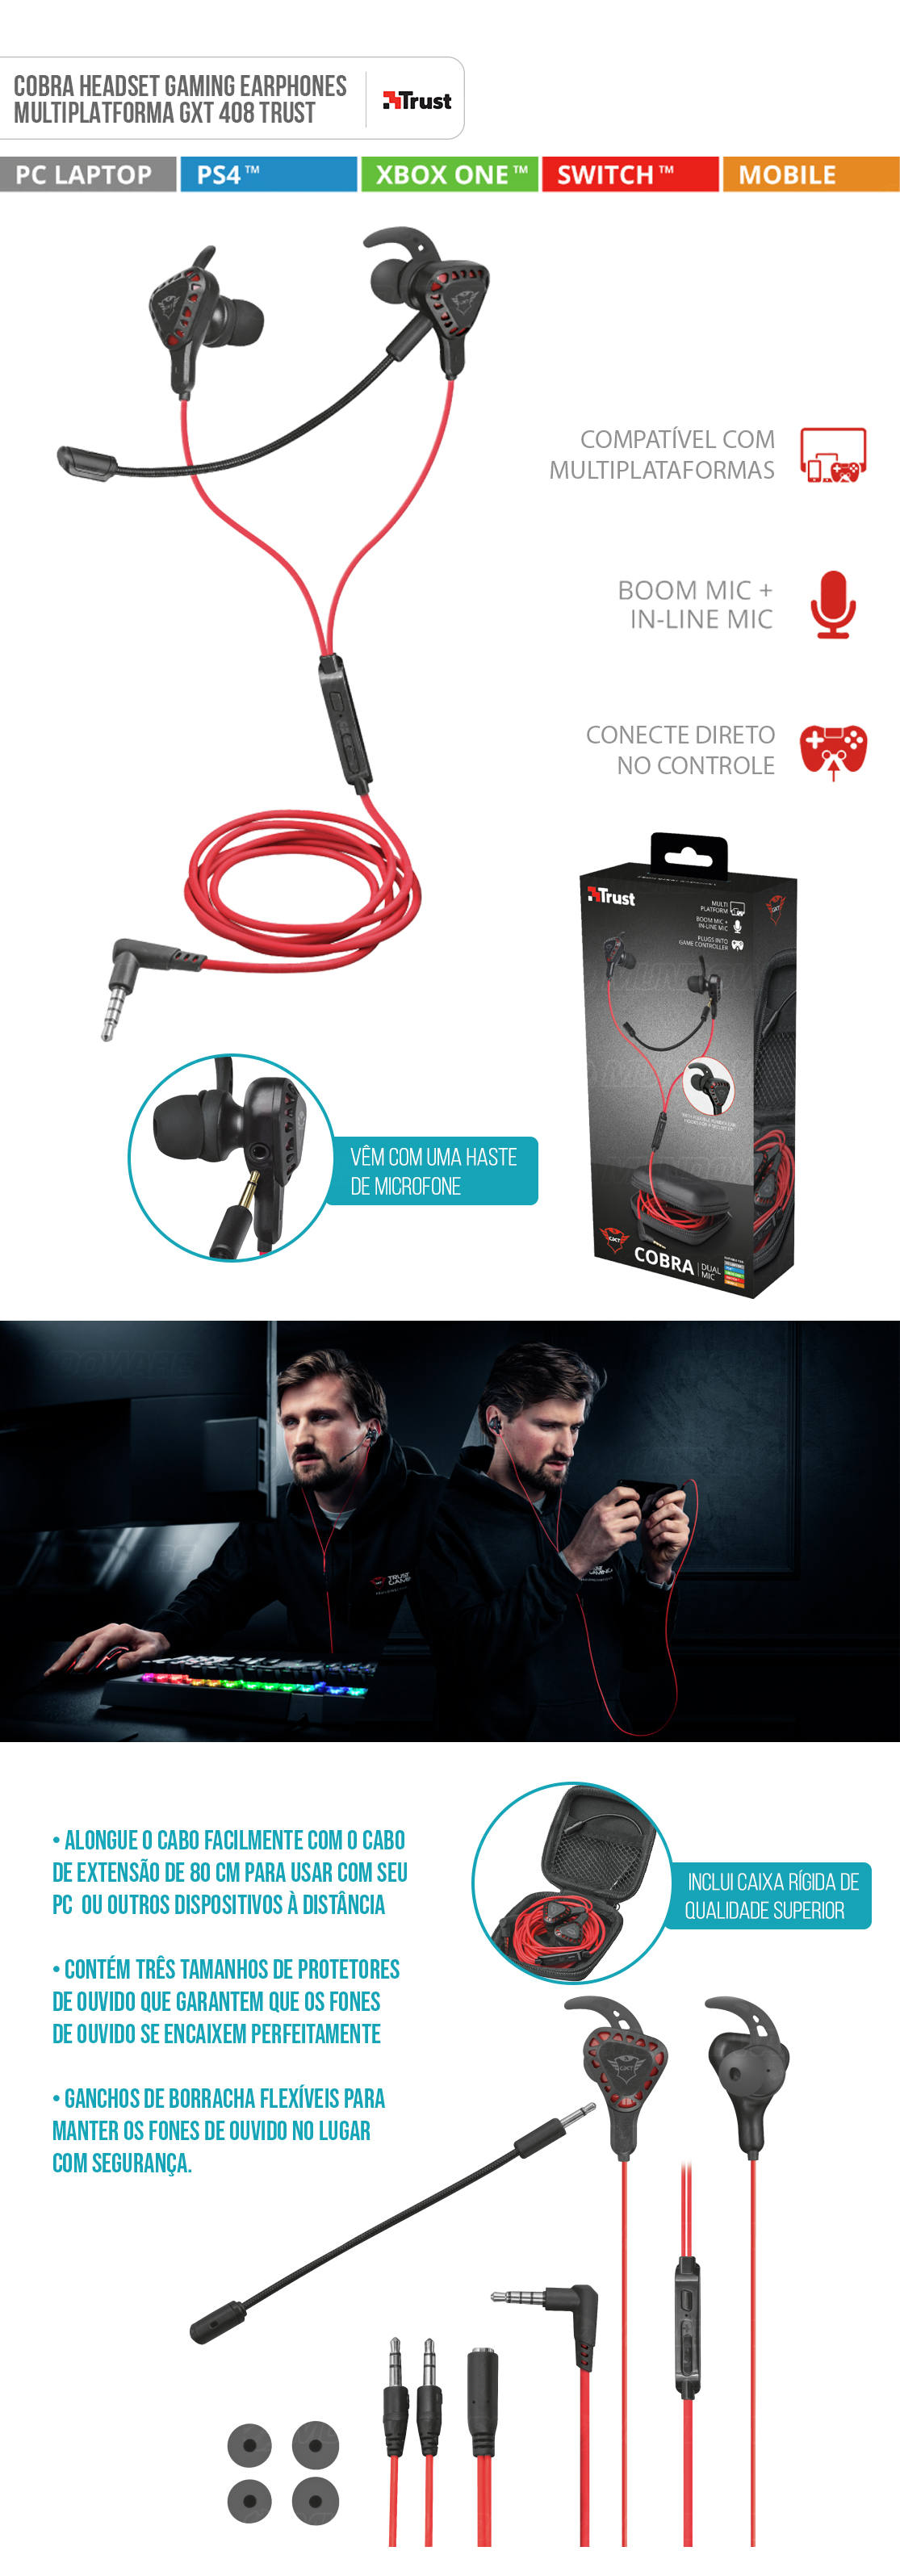 Earphones Gaming Cobra GXT 408 Multiplataforma Microfones Duplos e Boom Destatável Projetado para Jogos Trust